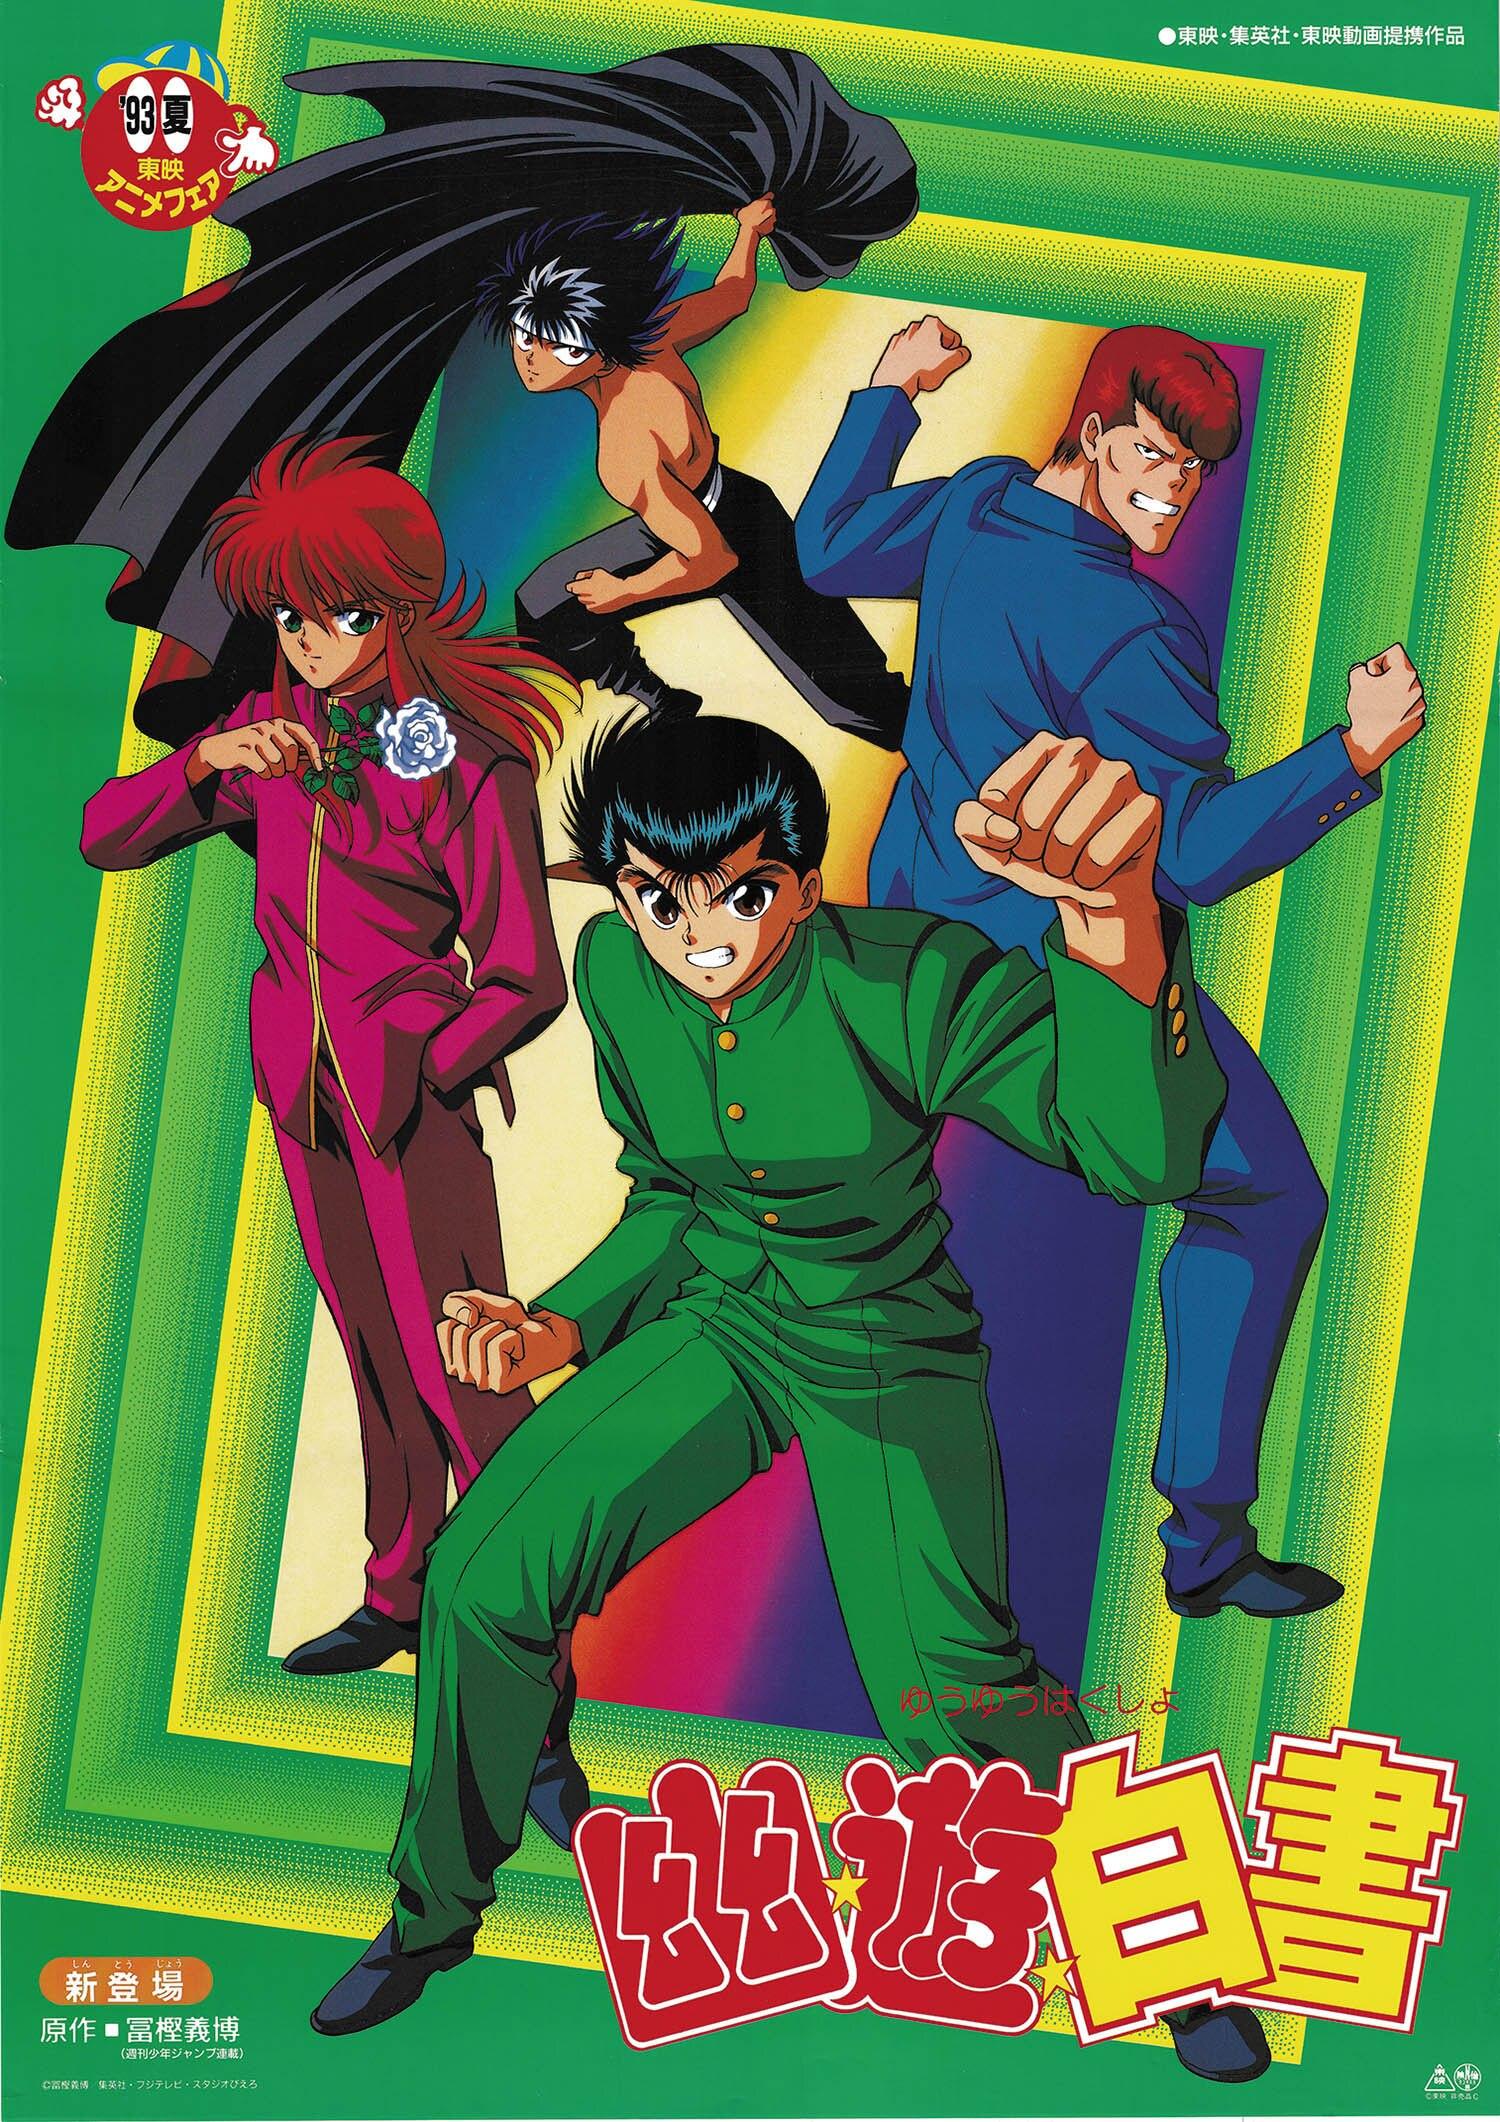 Yu Yu Hakusho Movie Version Poster